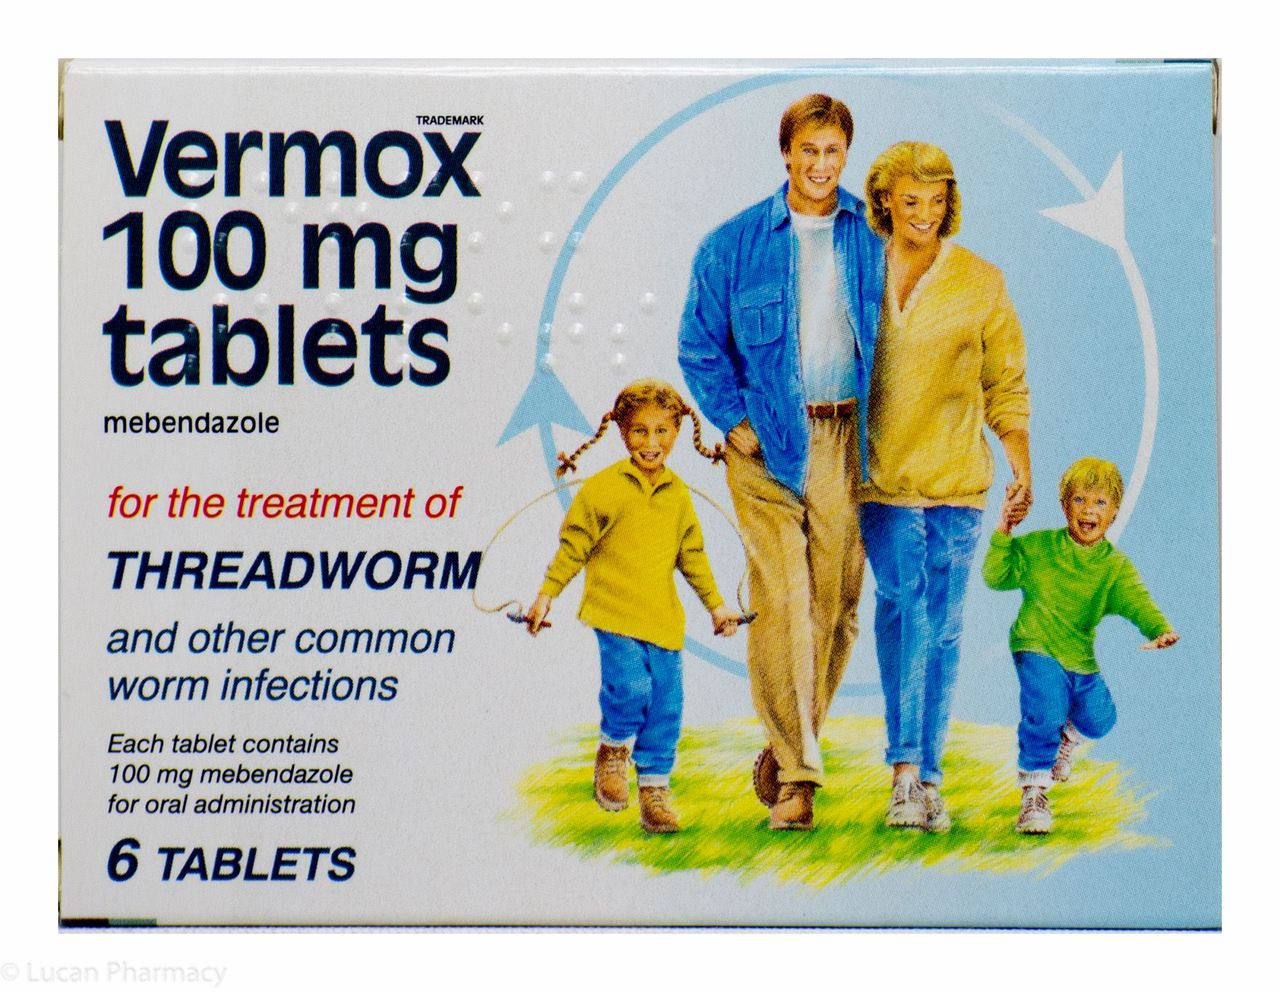 The Vermox remedy